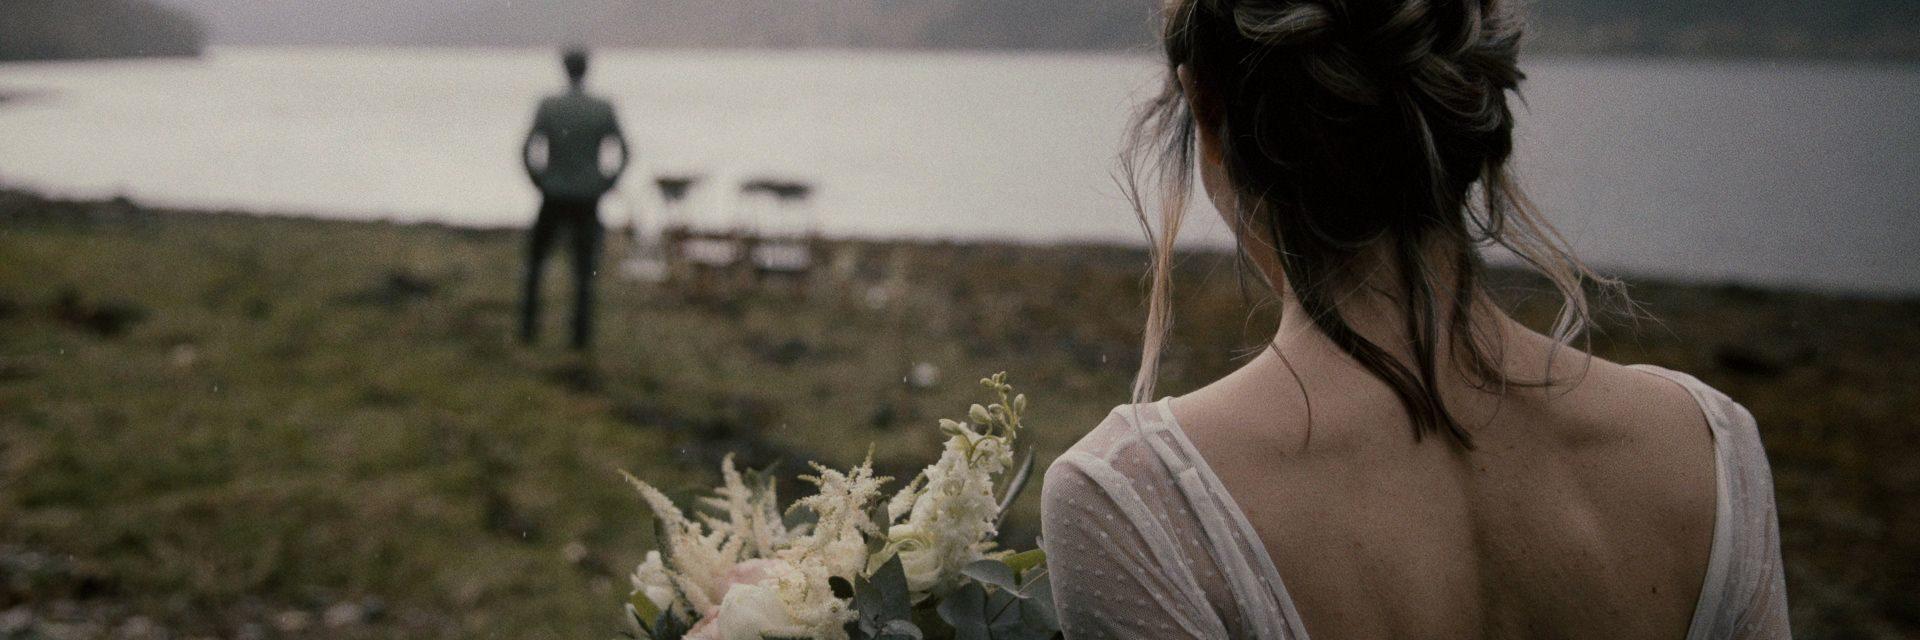 Tenerife-wedding-videographer-cinemate-films-02